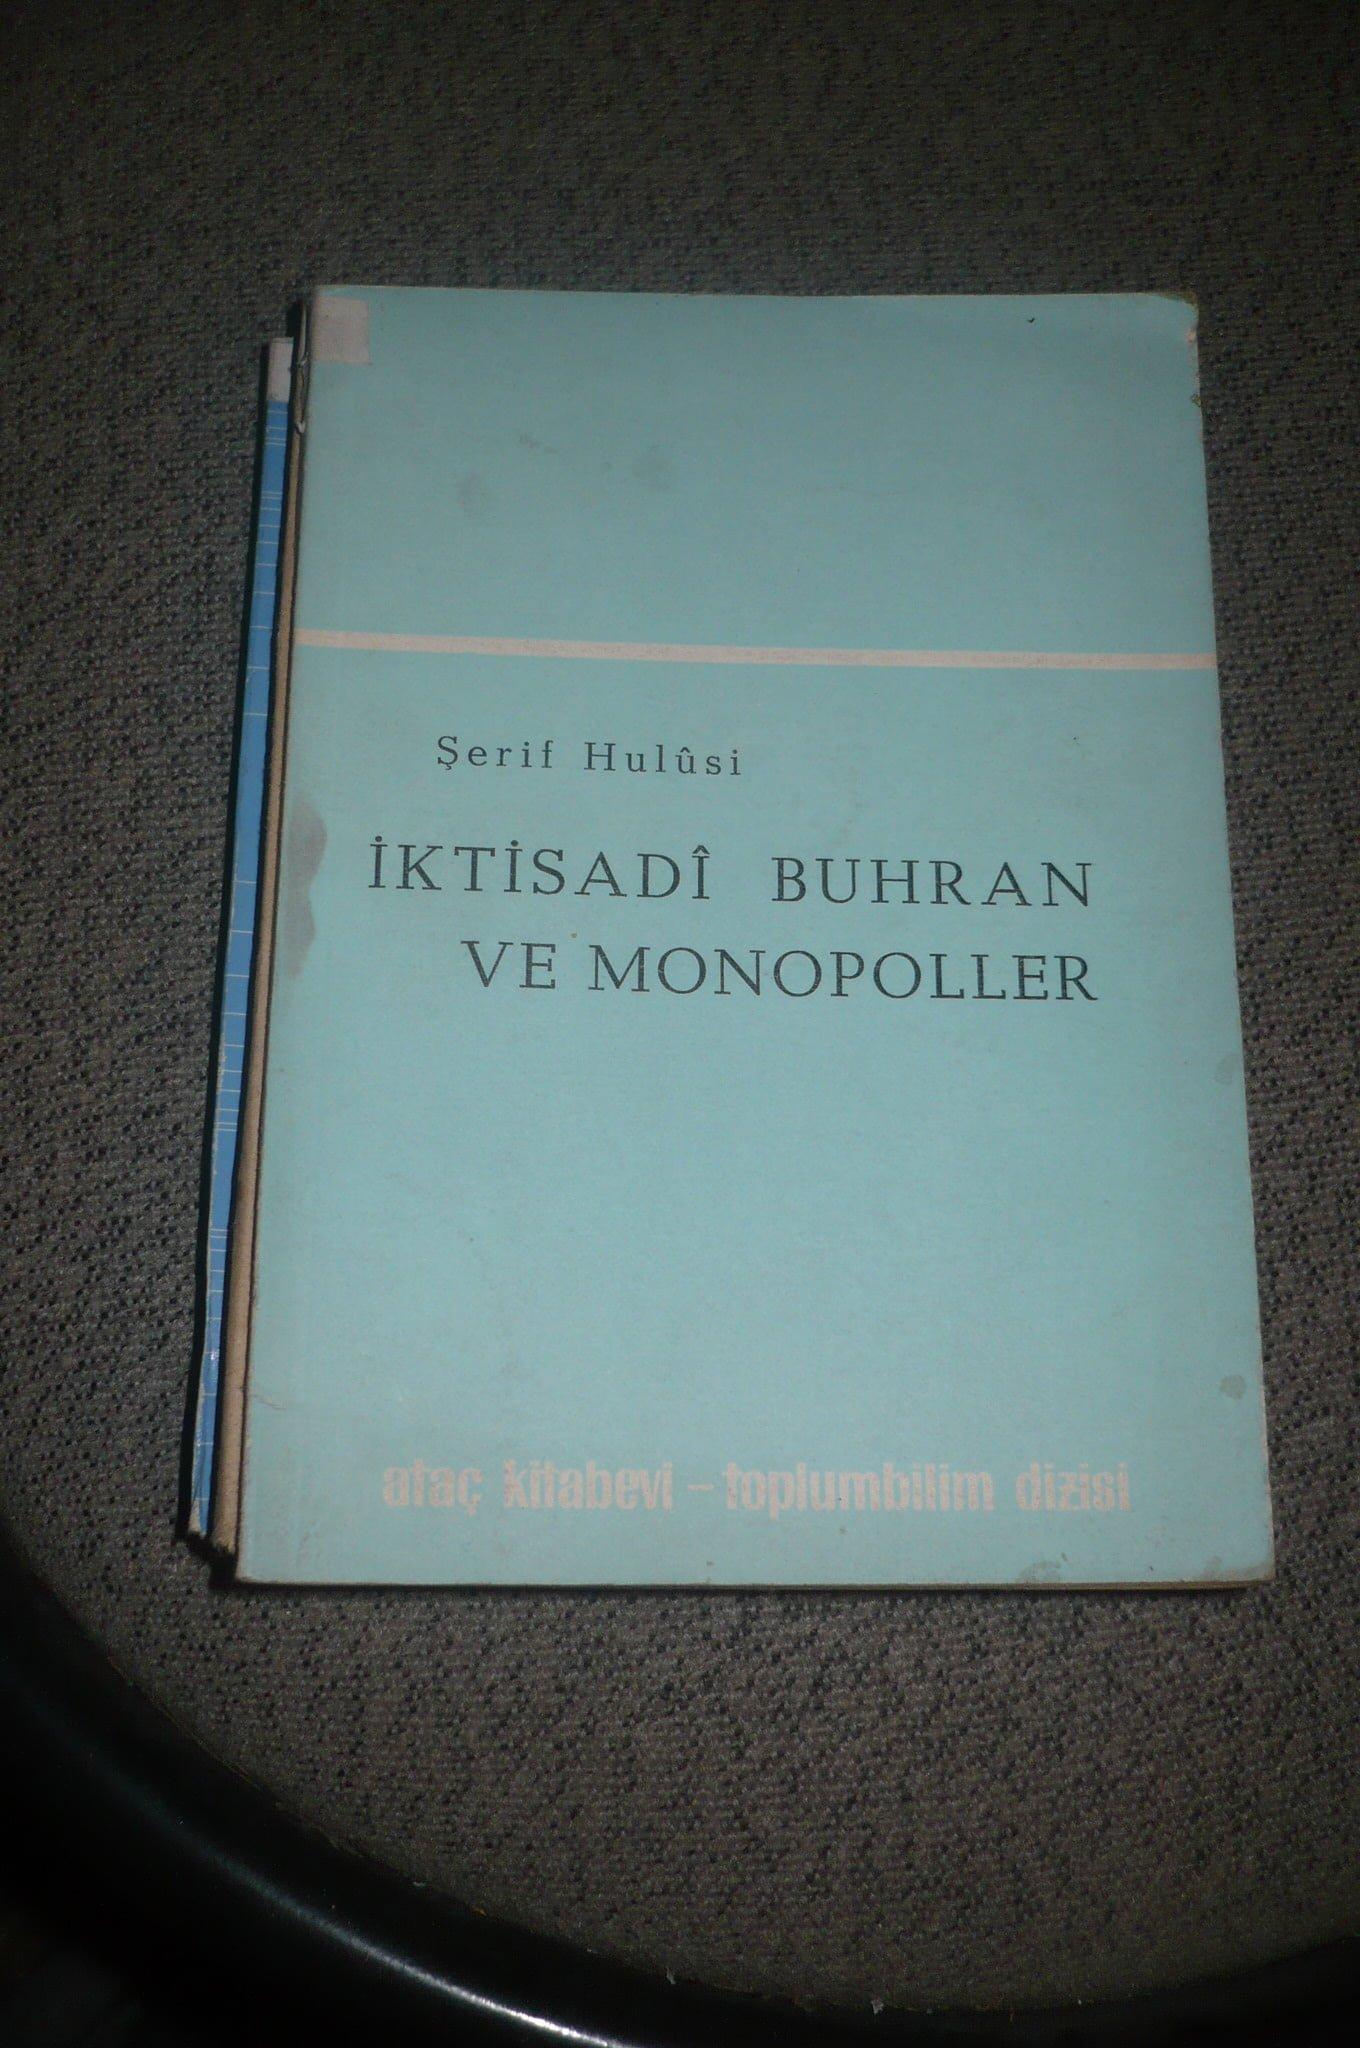 İKTİSADİ BUHRAN VE MONOPOLLER/Şerif Hulusi/15 tl